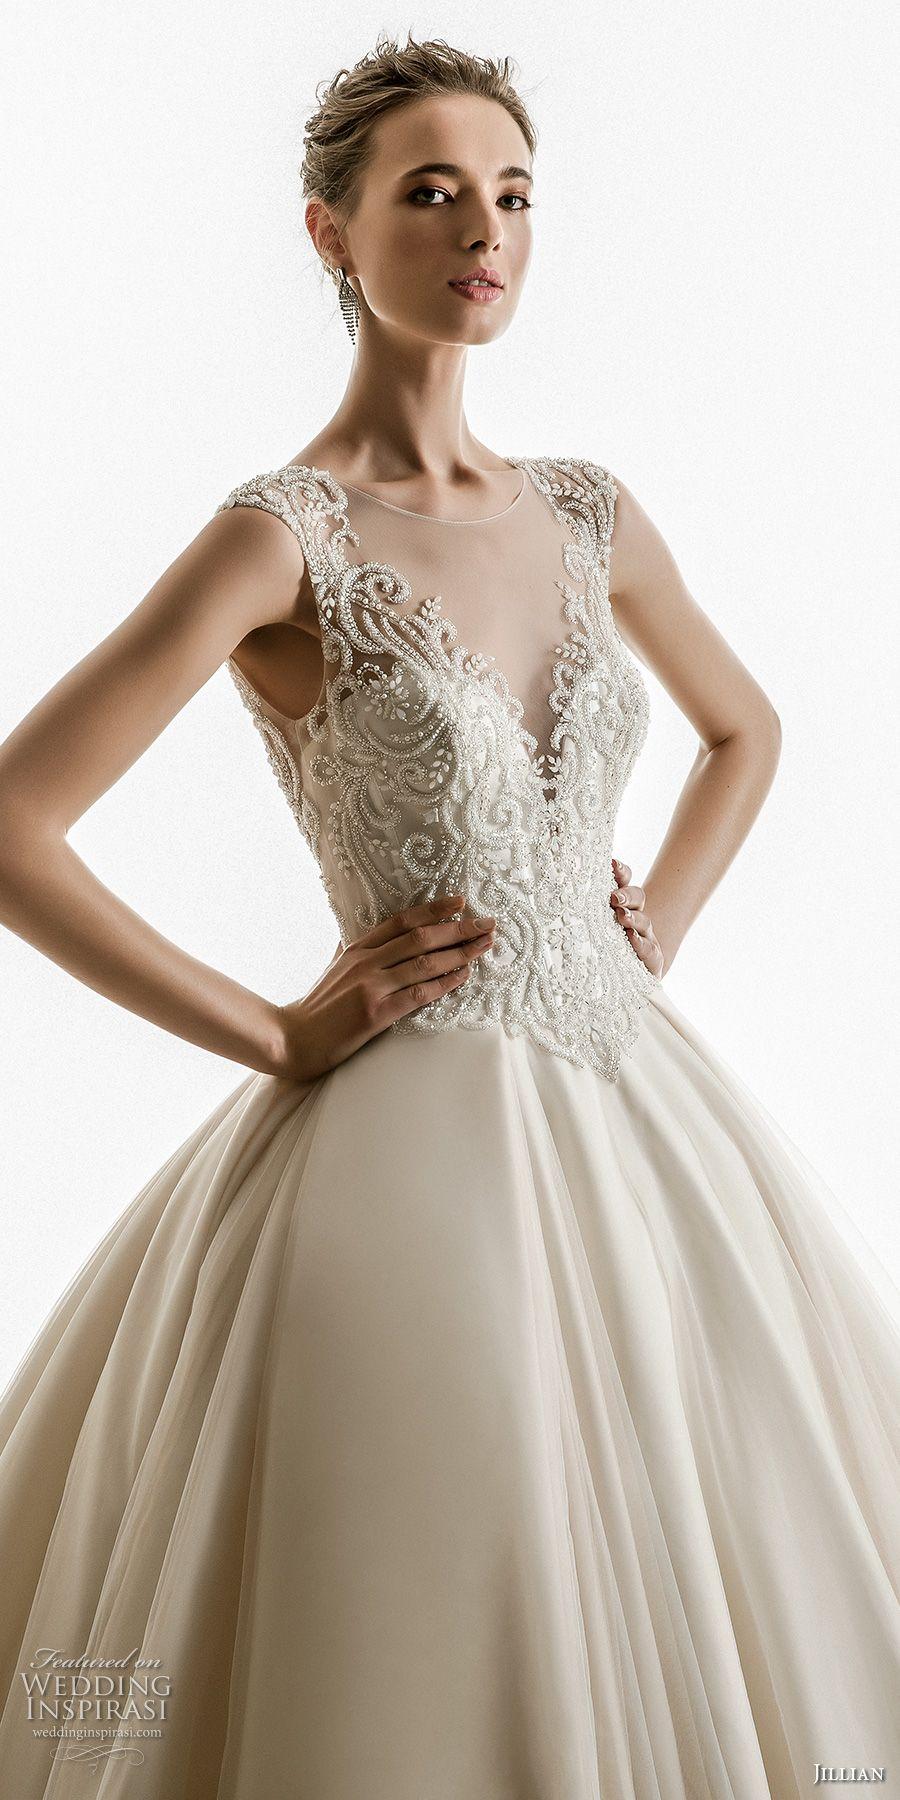 Jillian wedding dresses wedding dresses pinterest